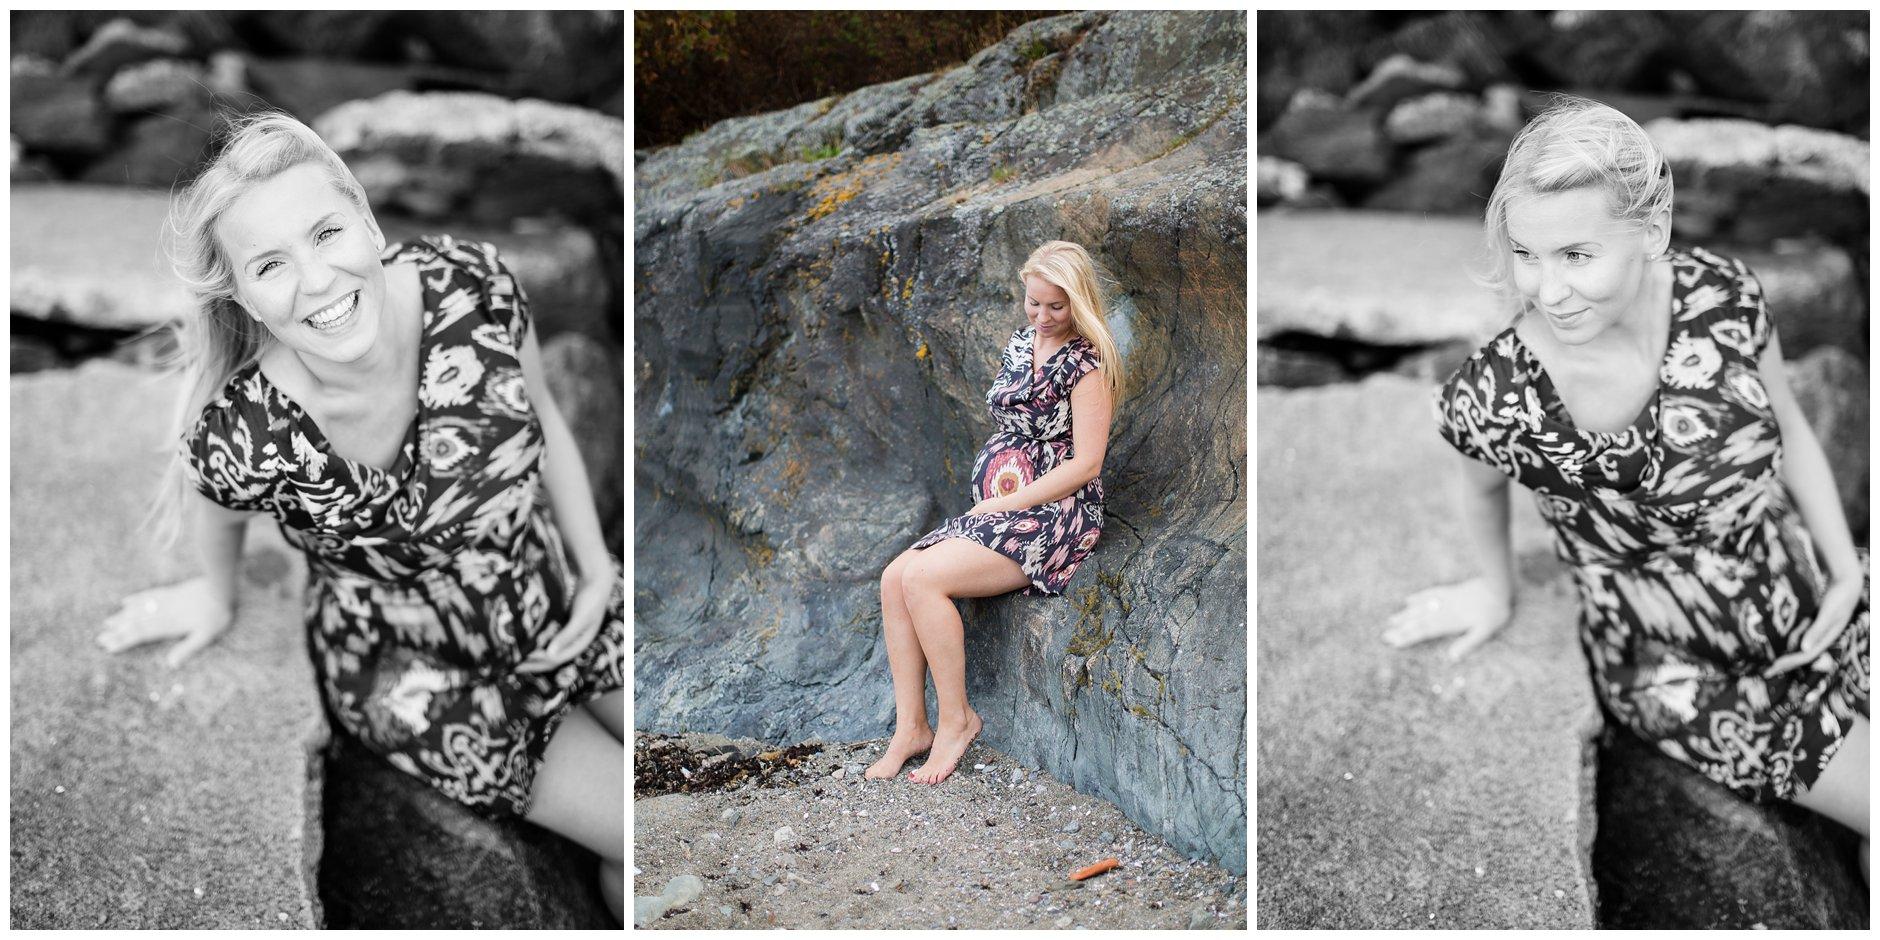 Fotograf-Eline-Jacobine-Gravidfotografering-Maternity-Alexandra-Villa-Malla_0006